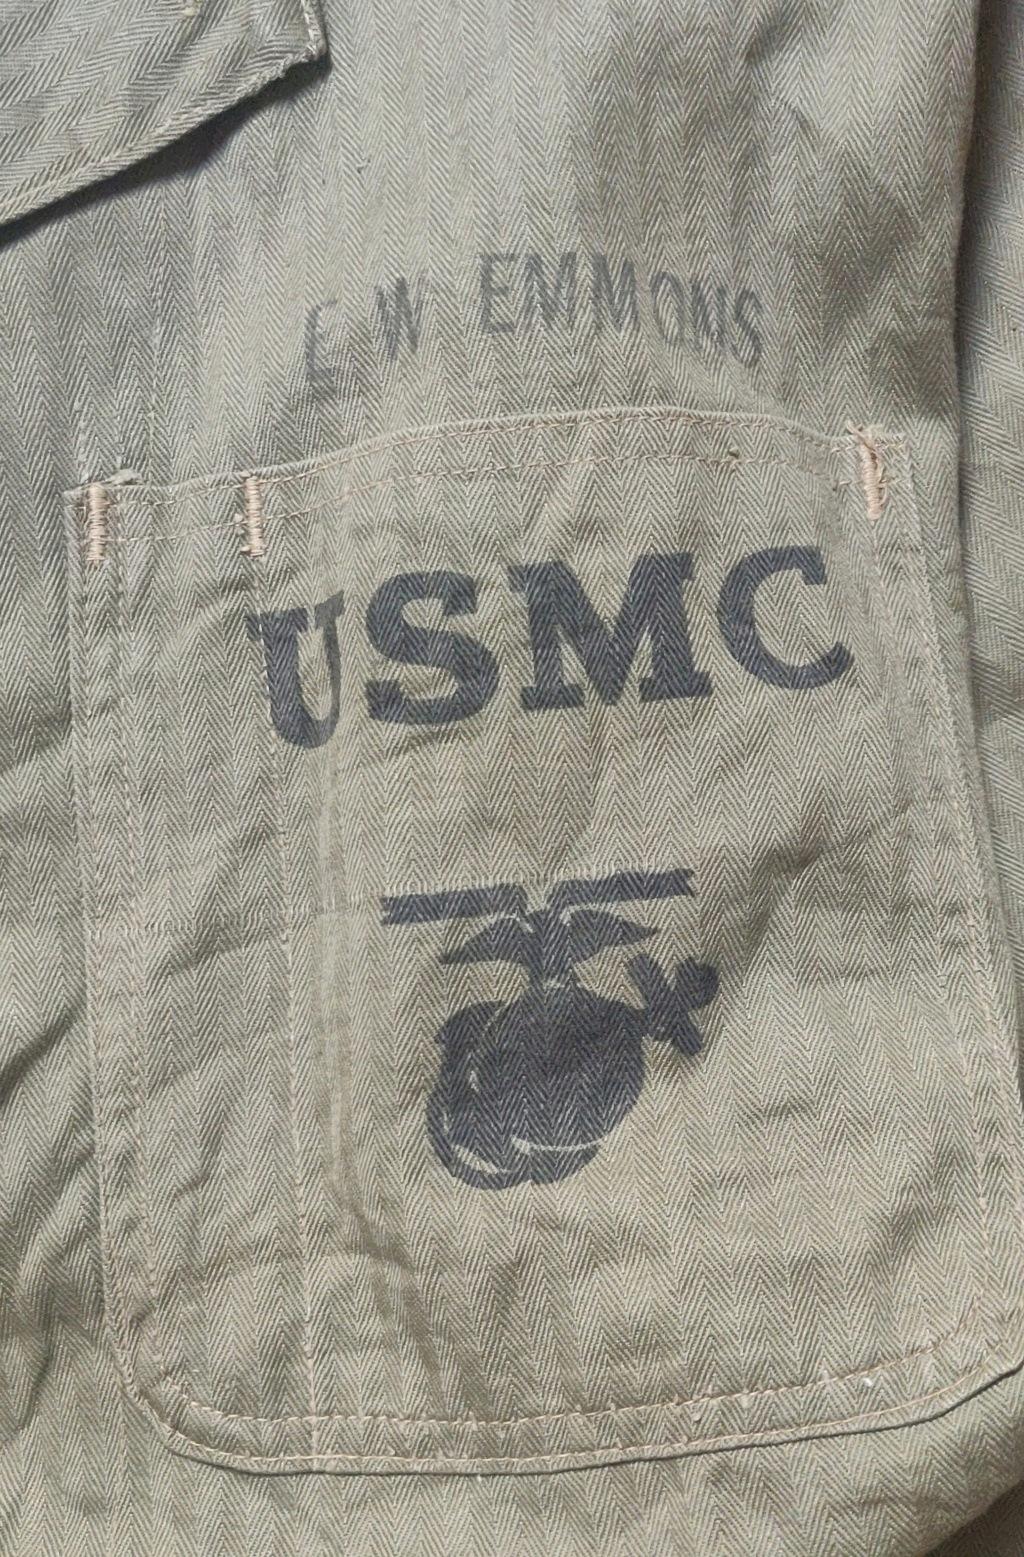 Aide pour trouver marines USMC  Img_2159